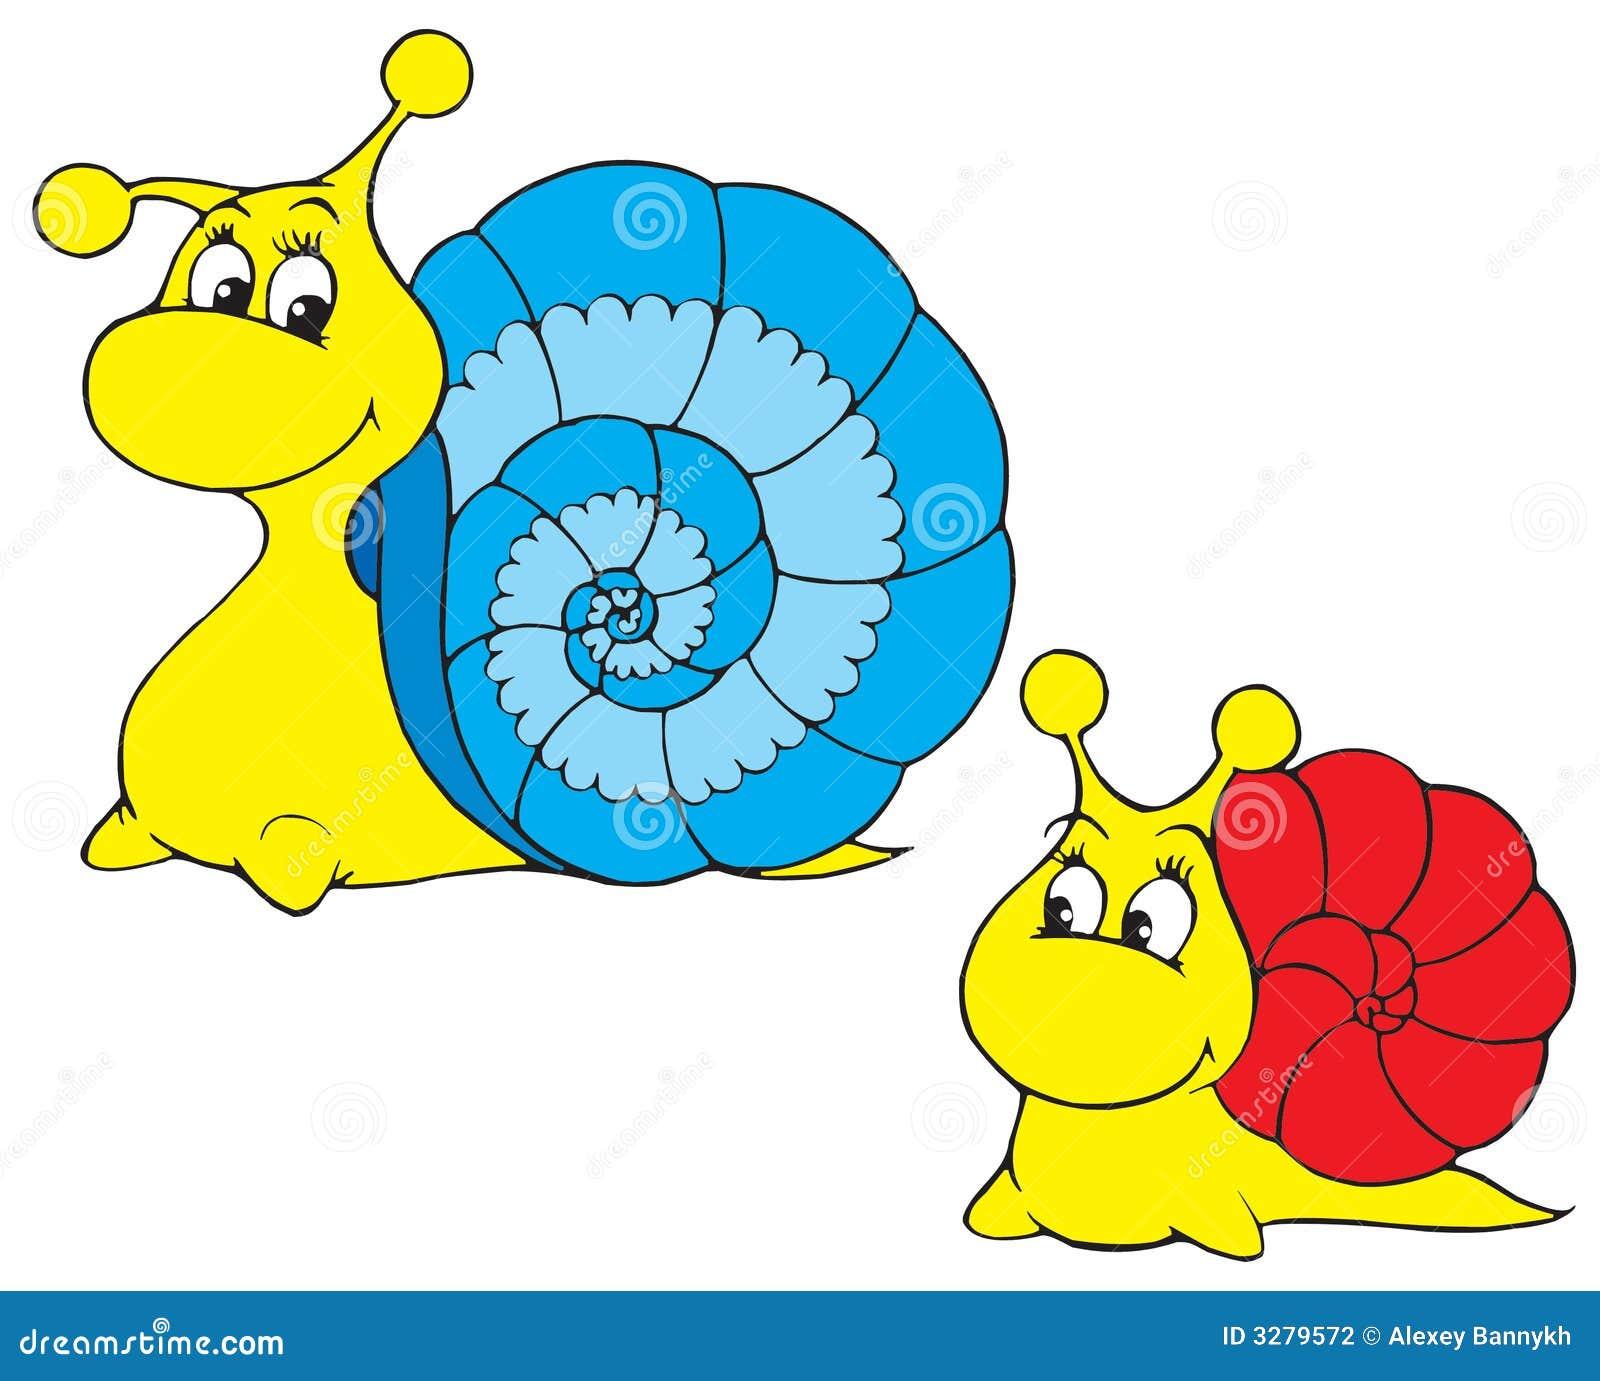 Snail Vector Clip Art Stock Vector Image Of Childish